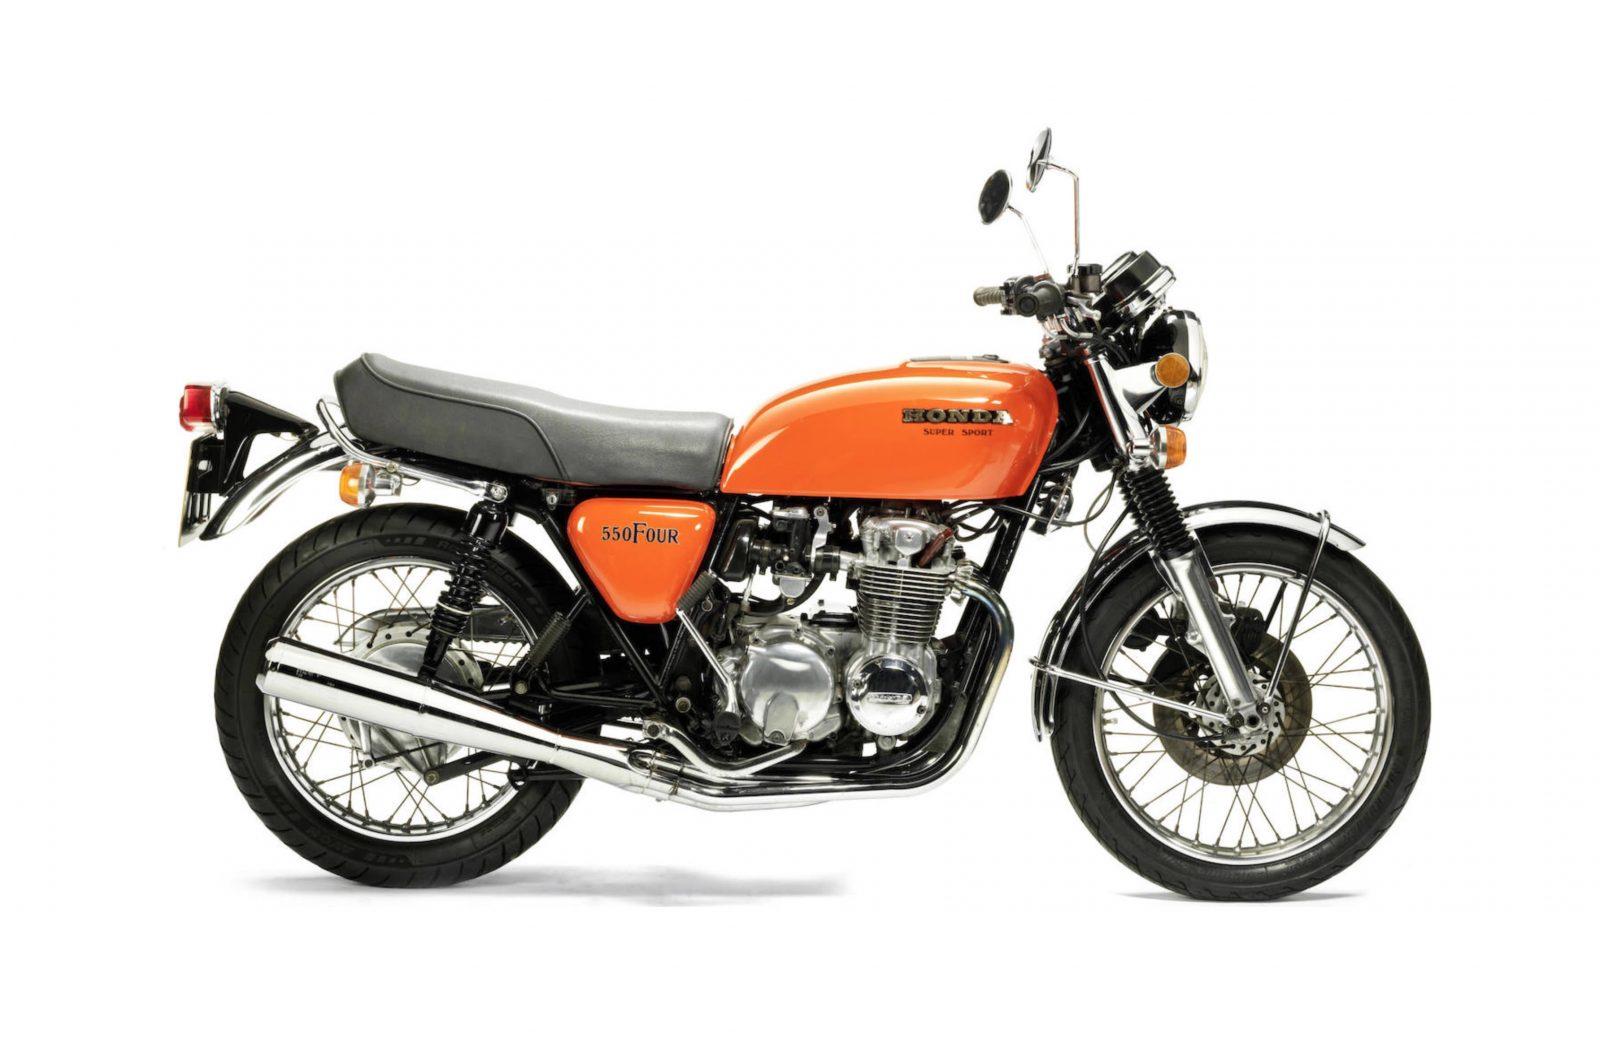 honda cb550f super sport rh silodrome com 1976 Honda CJ360T 1975 Honda Motorcycle CB 550